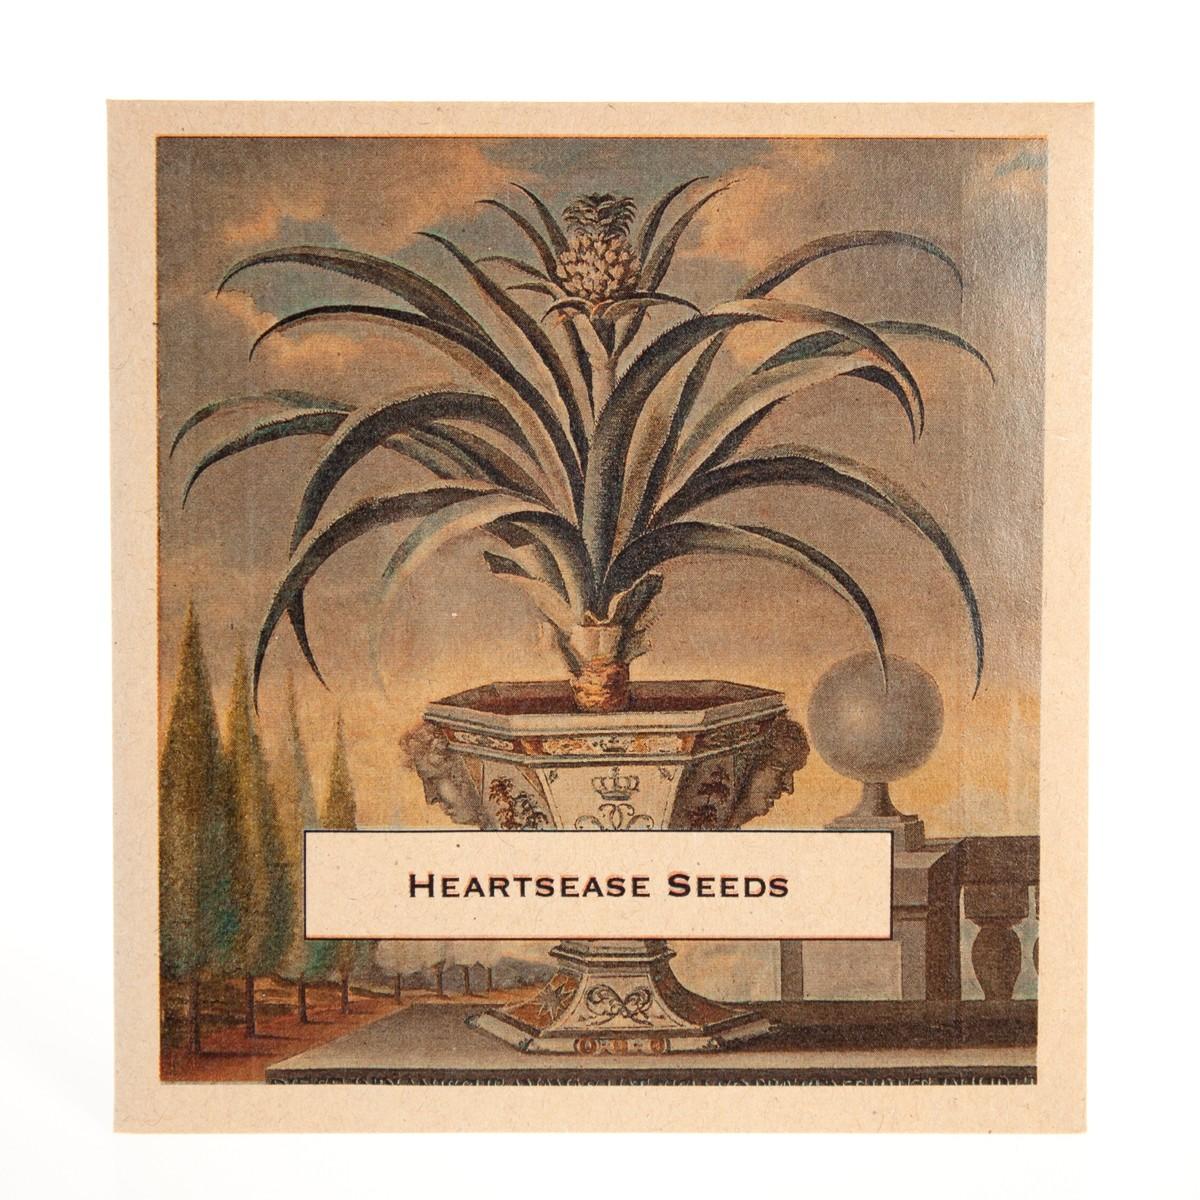 Photo of Heartsease Seeds